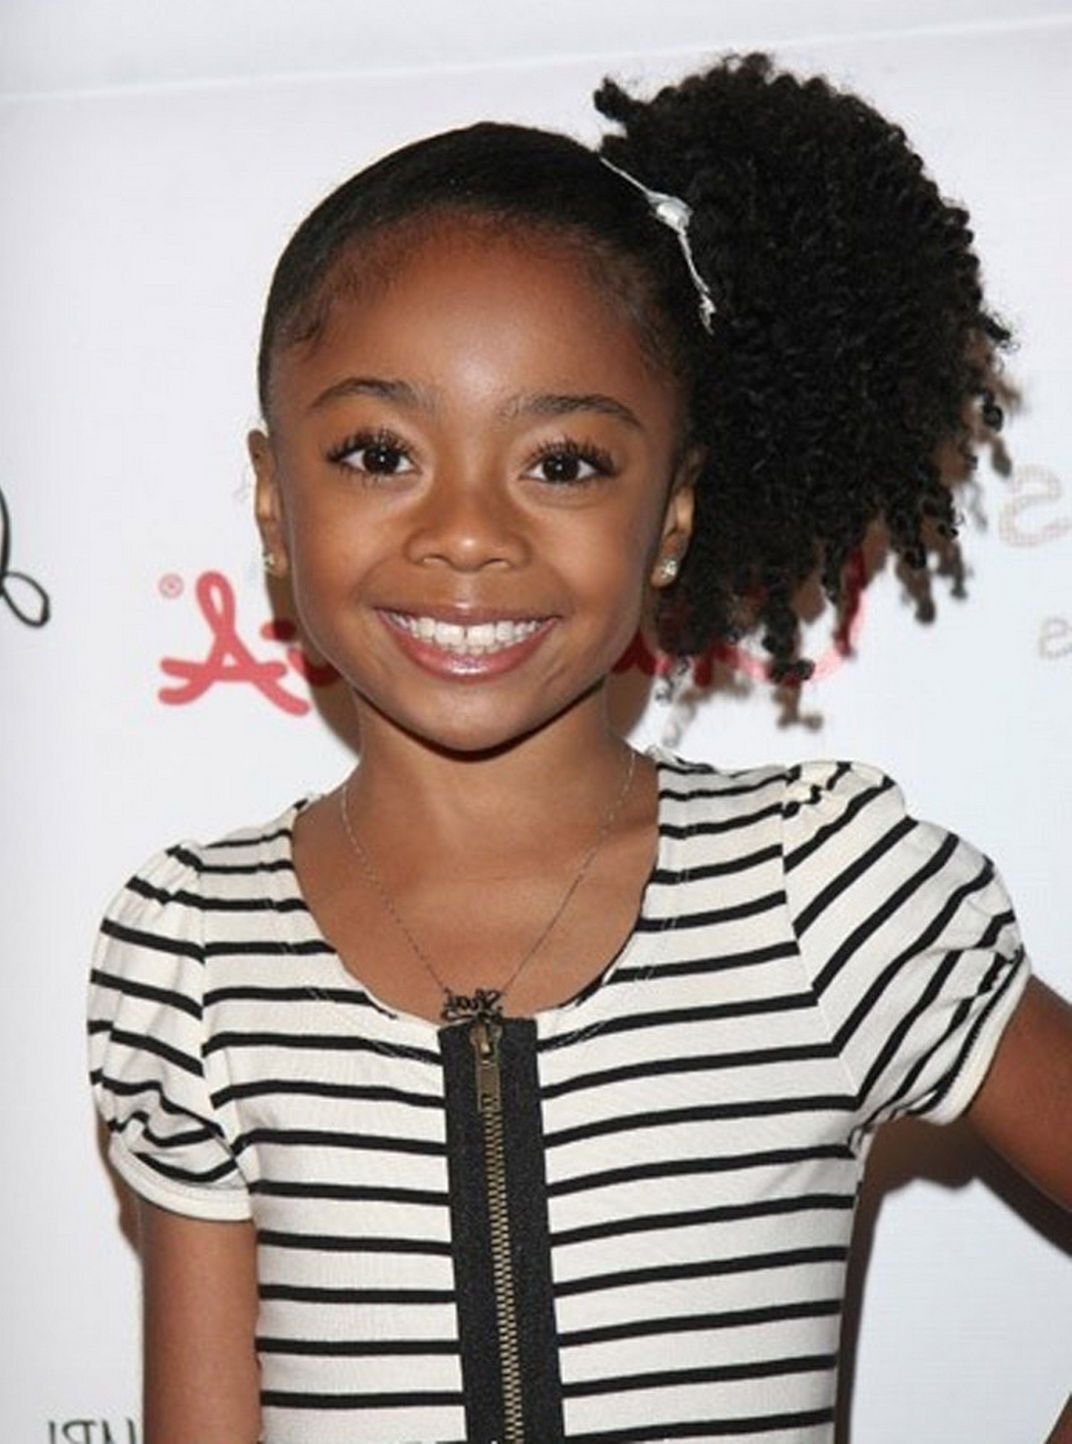 Awe Inspiring 1000 Images About Hairstyles On Pinterest Black Little Girls Short Hairstyles Gunalazisus